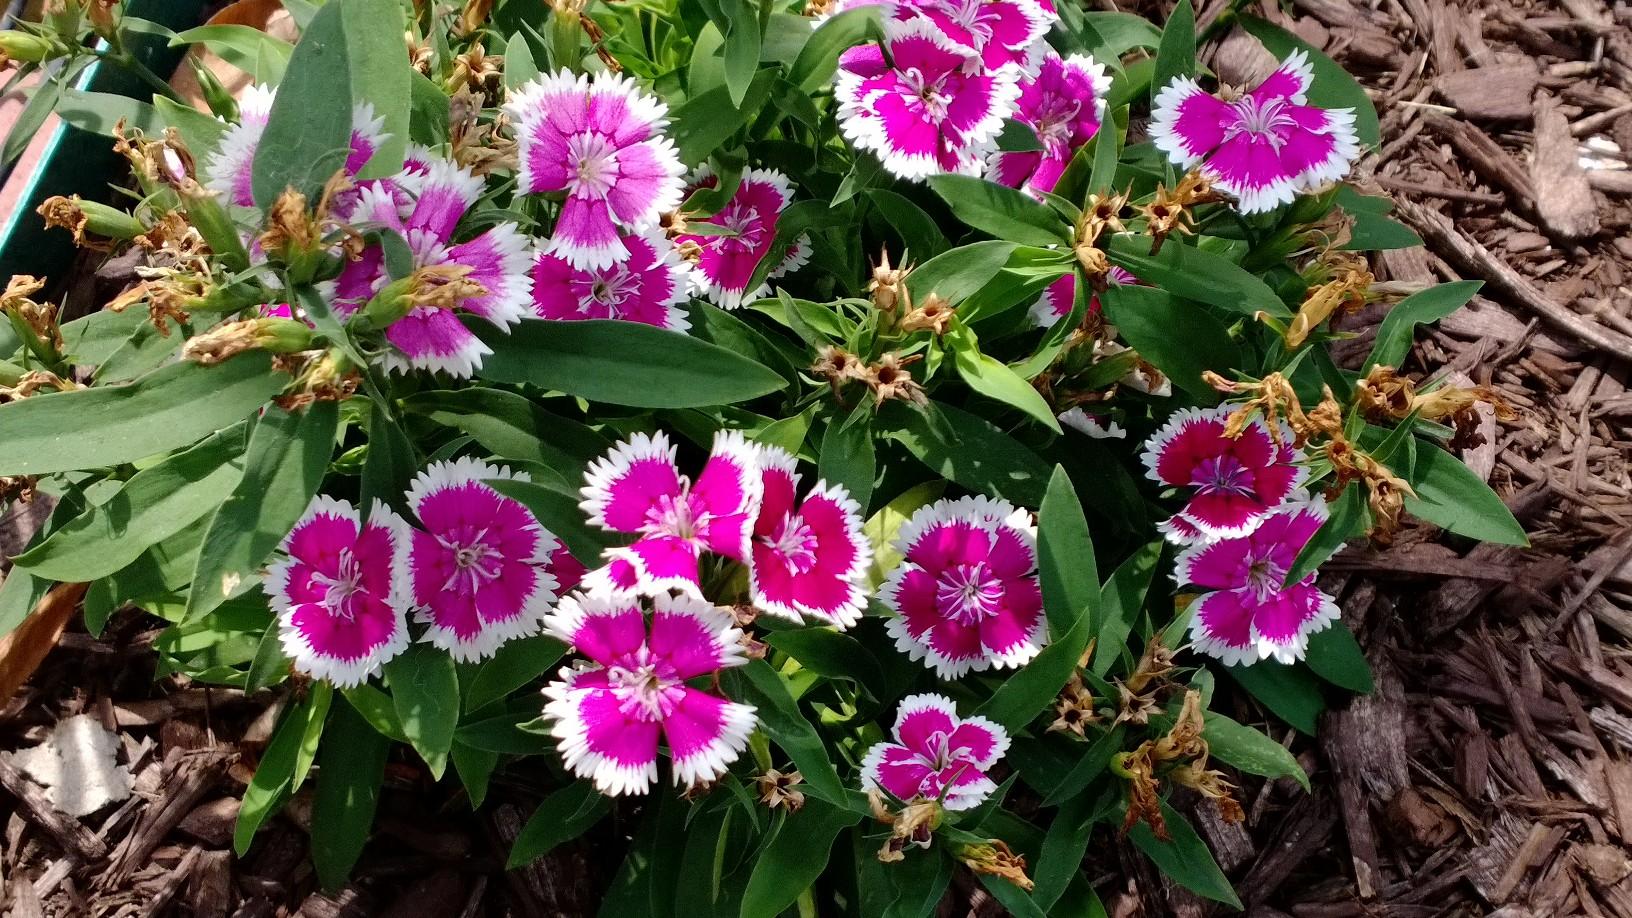 Flowers via AT&T Nokia Lumia 1020